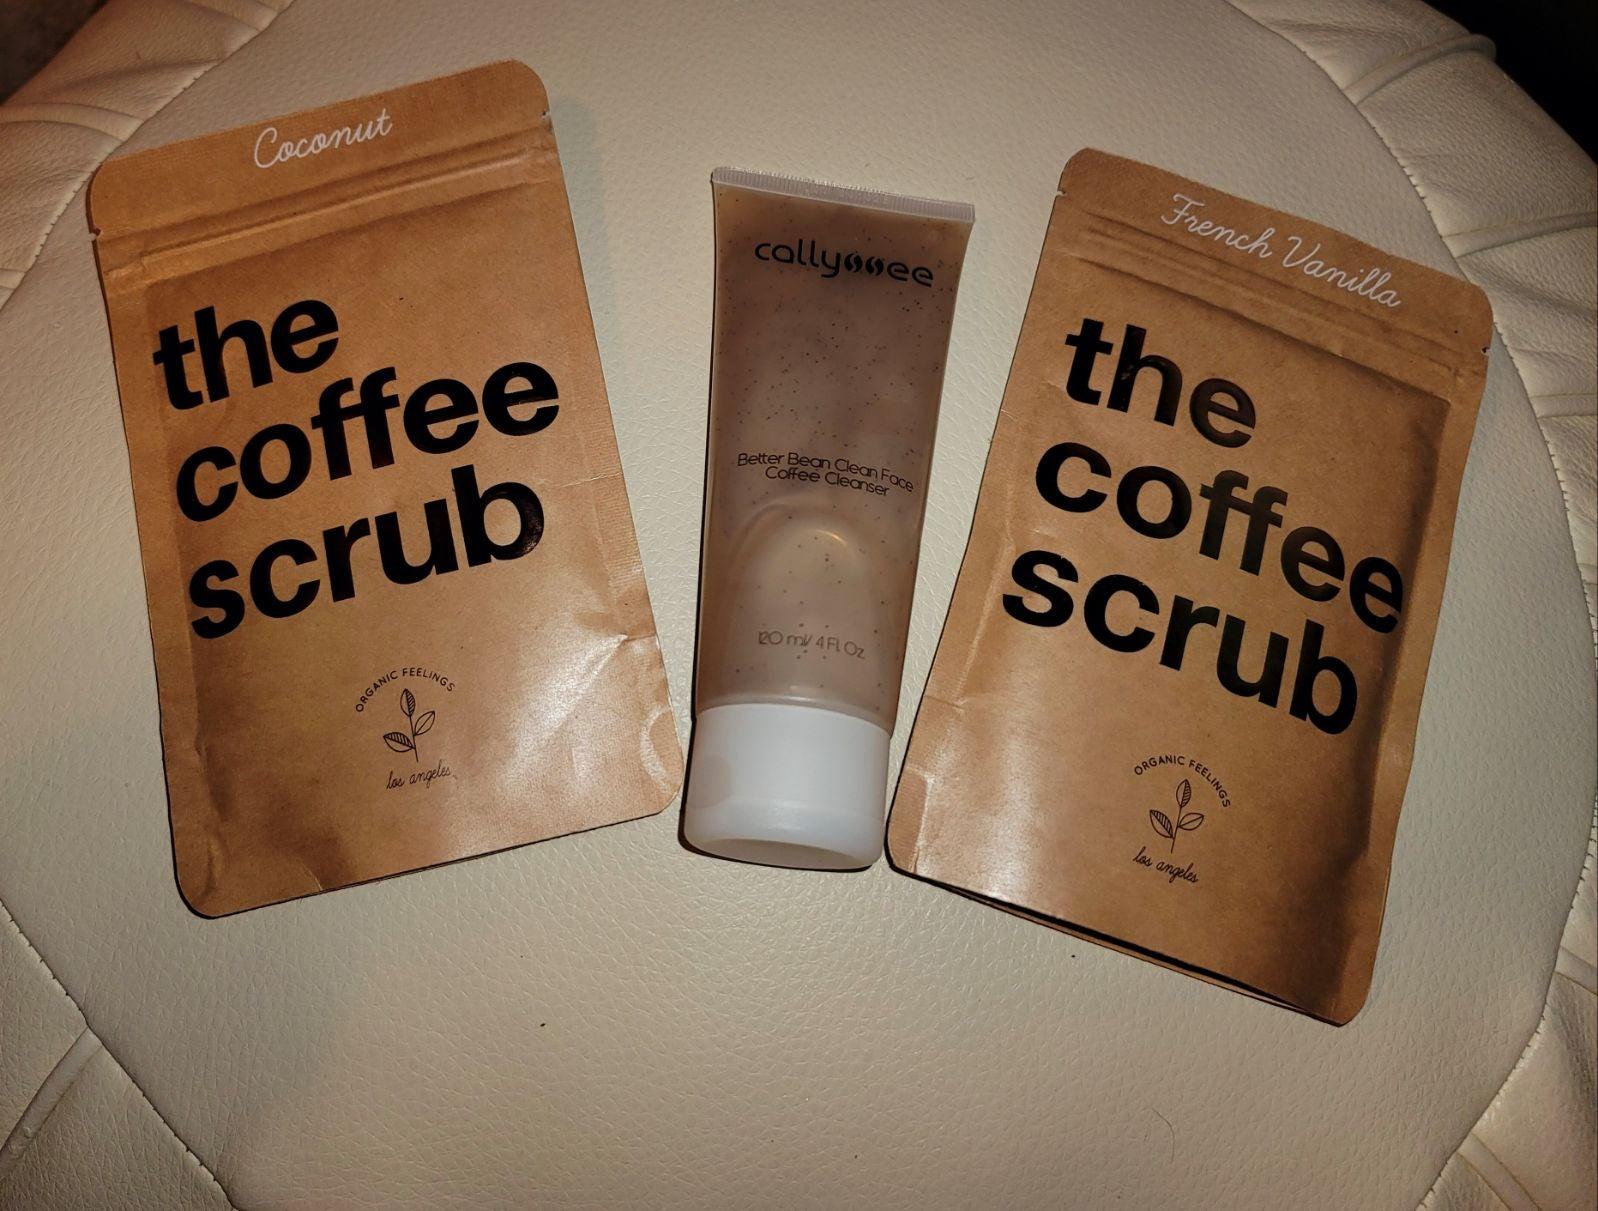 Coffee face wash and body scrub